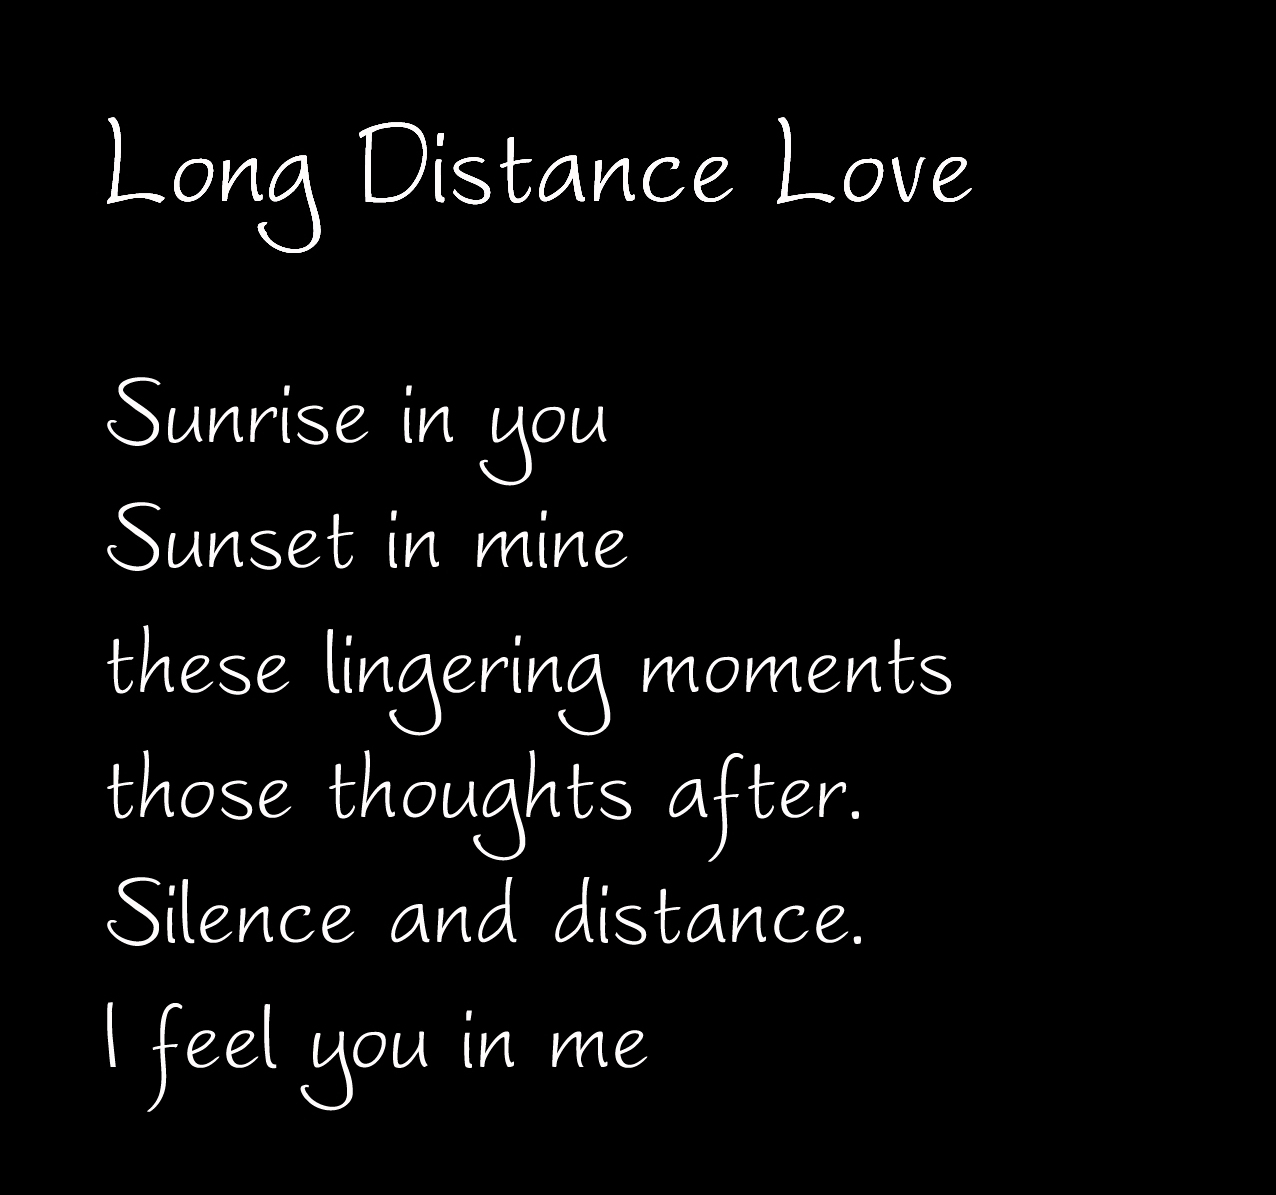 Loneliness Love Quotes Loneliness Love Quotes Loneliness Quotes Loneliness Images